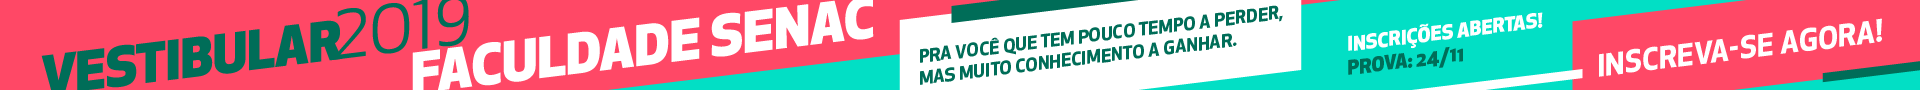 banner-vestibular-page